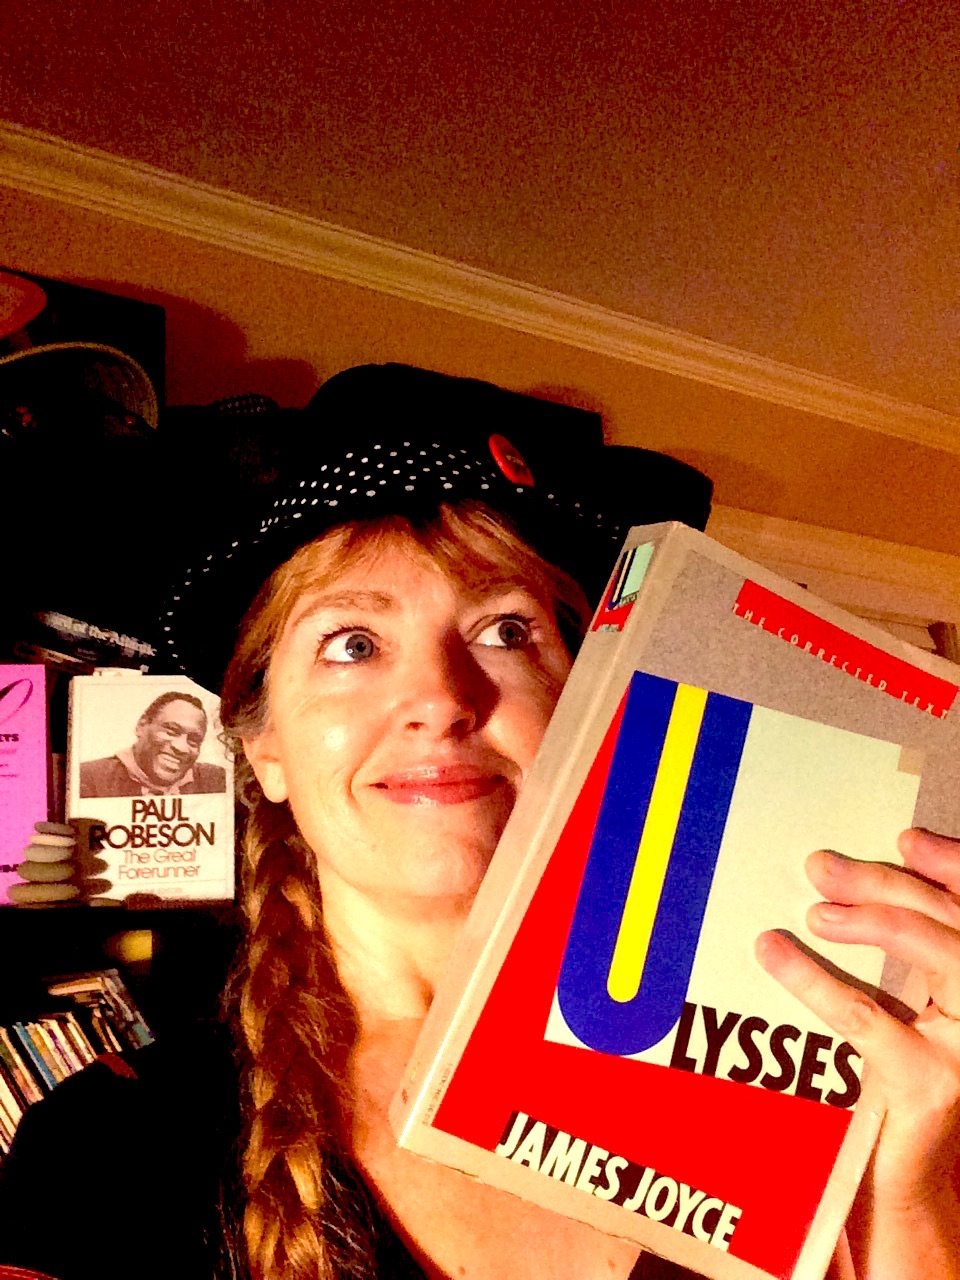 Anne McCueSongs on the WireTuesdays, 10 AM –12 PMUlyssesJames JoyceSylvia Beach -